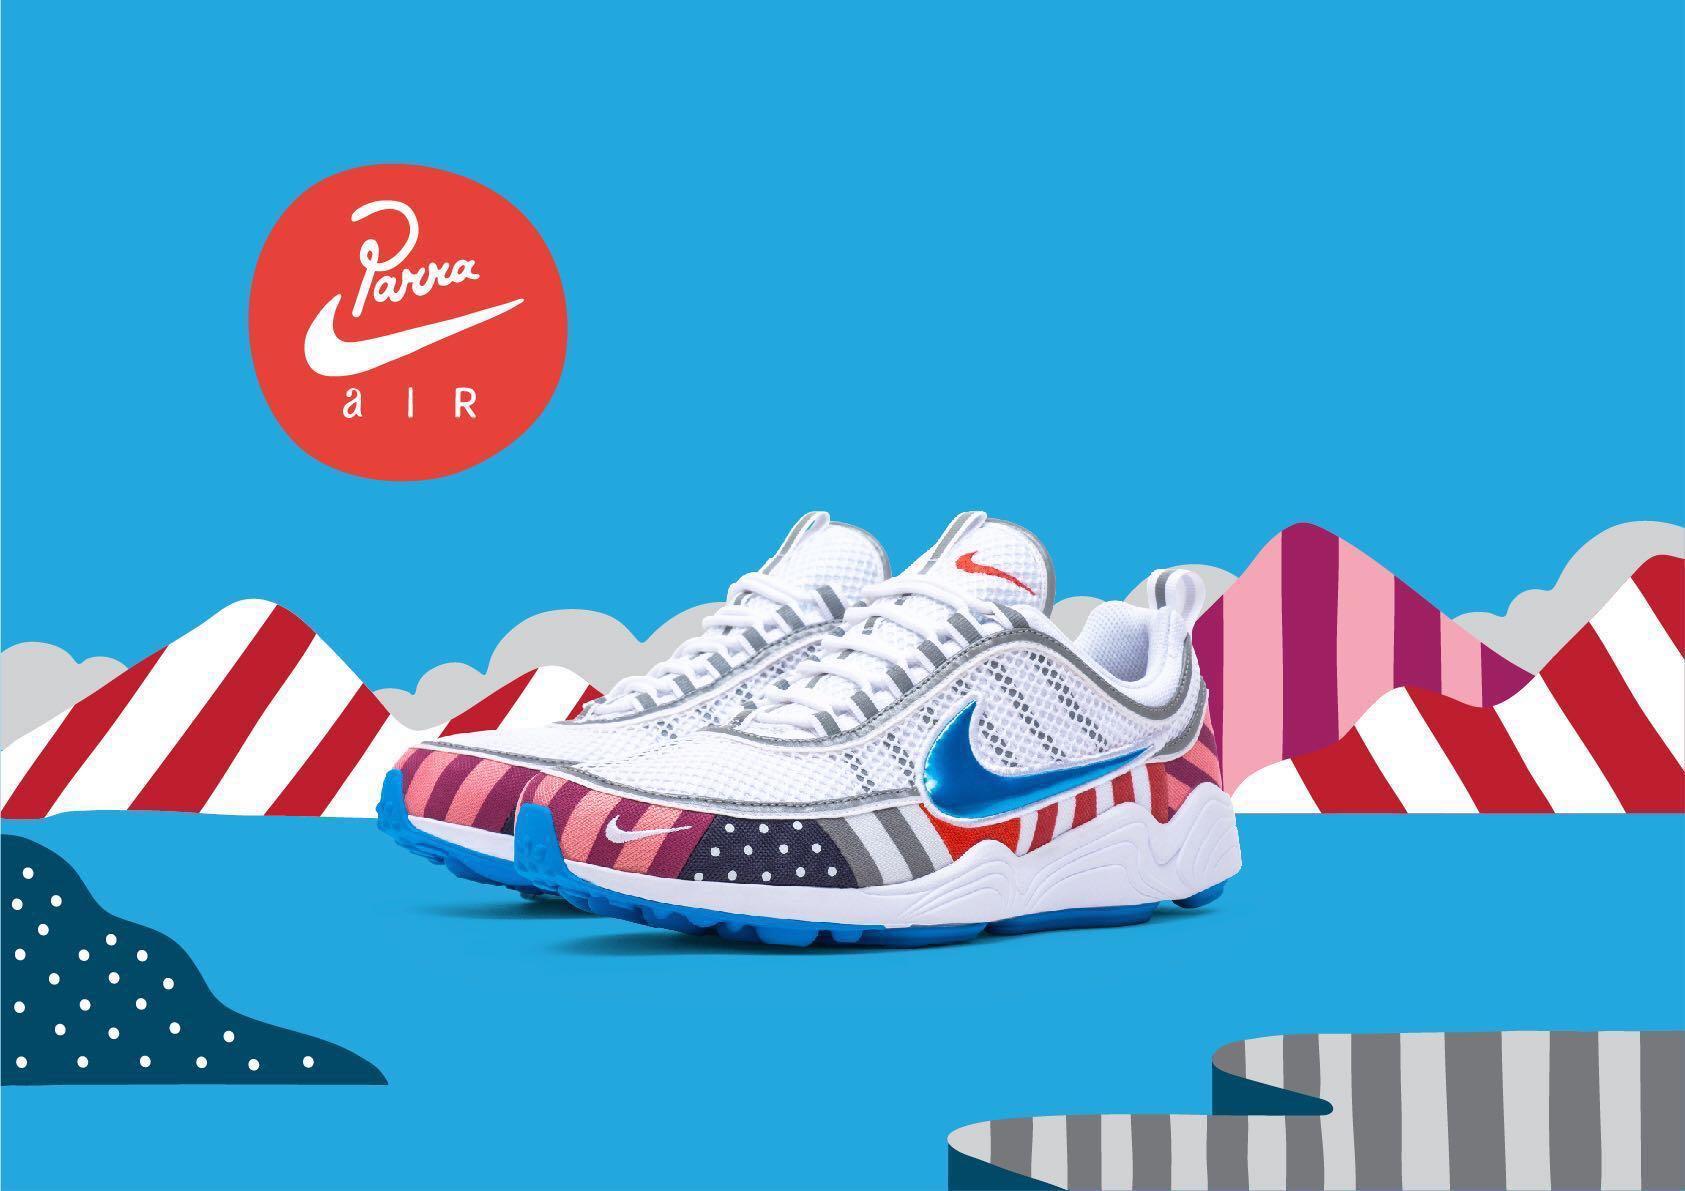 0d266e5b4f Nike X Parra Air Zoom Spiridon, Men's Fashion, Footwear, Sneakers on ...